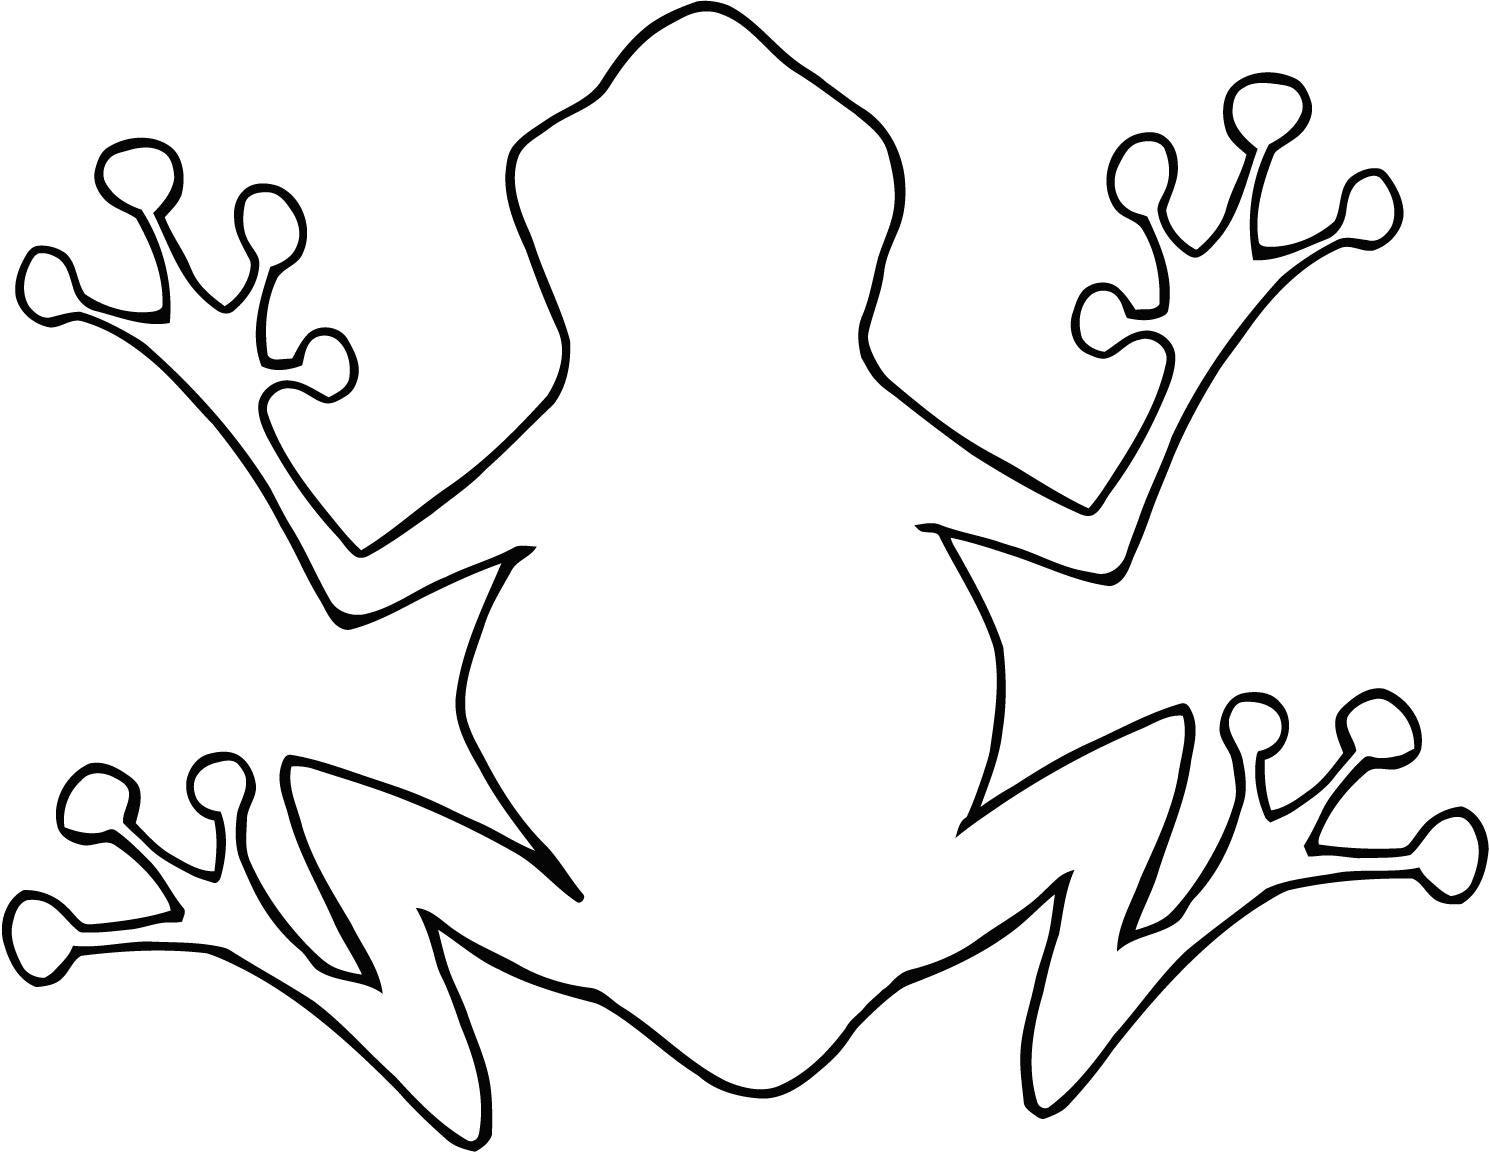 Tree Frog Outline